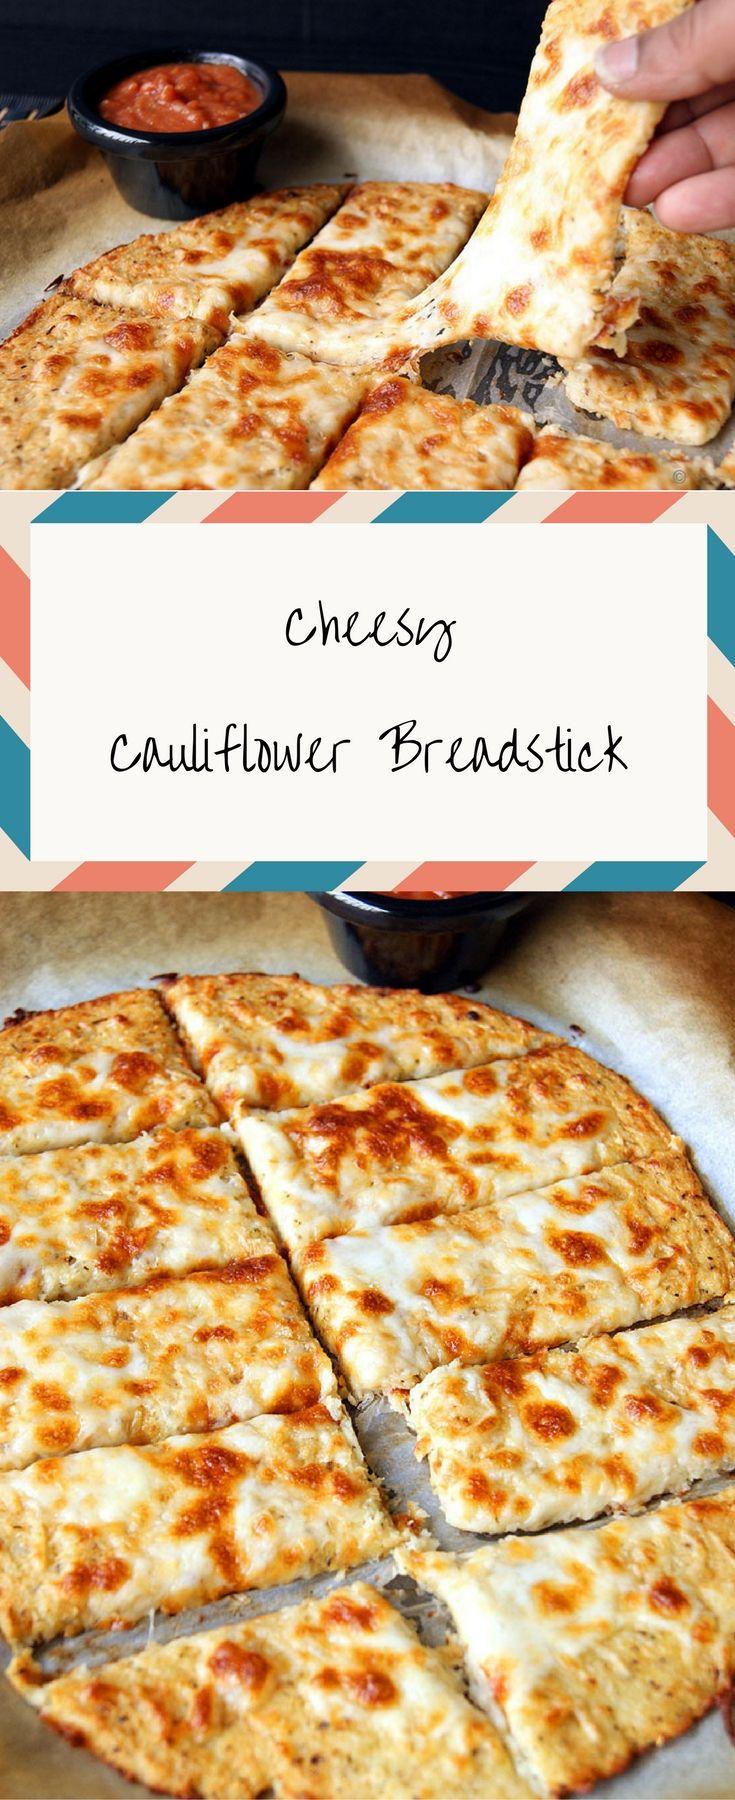 Cheesy Cauliflower Breadsticks Recipe Cauliflower Bread